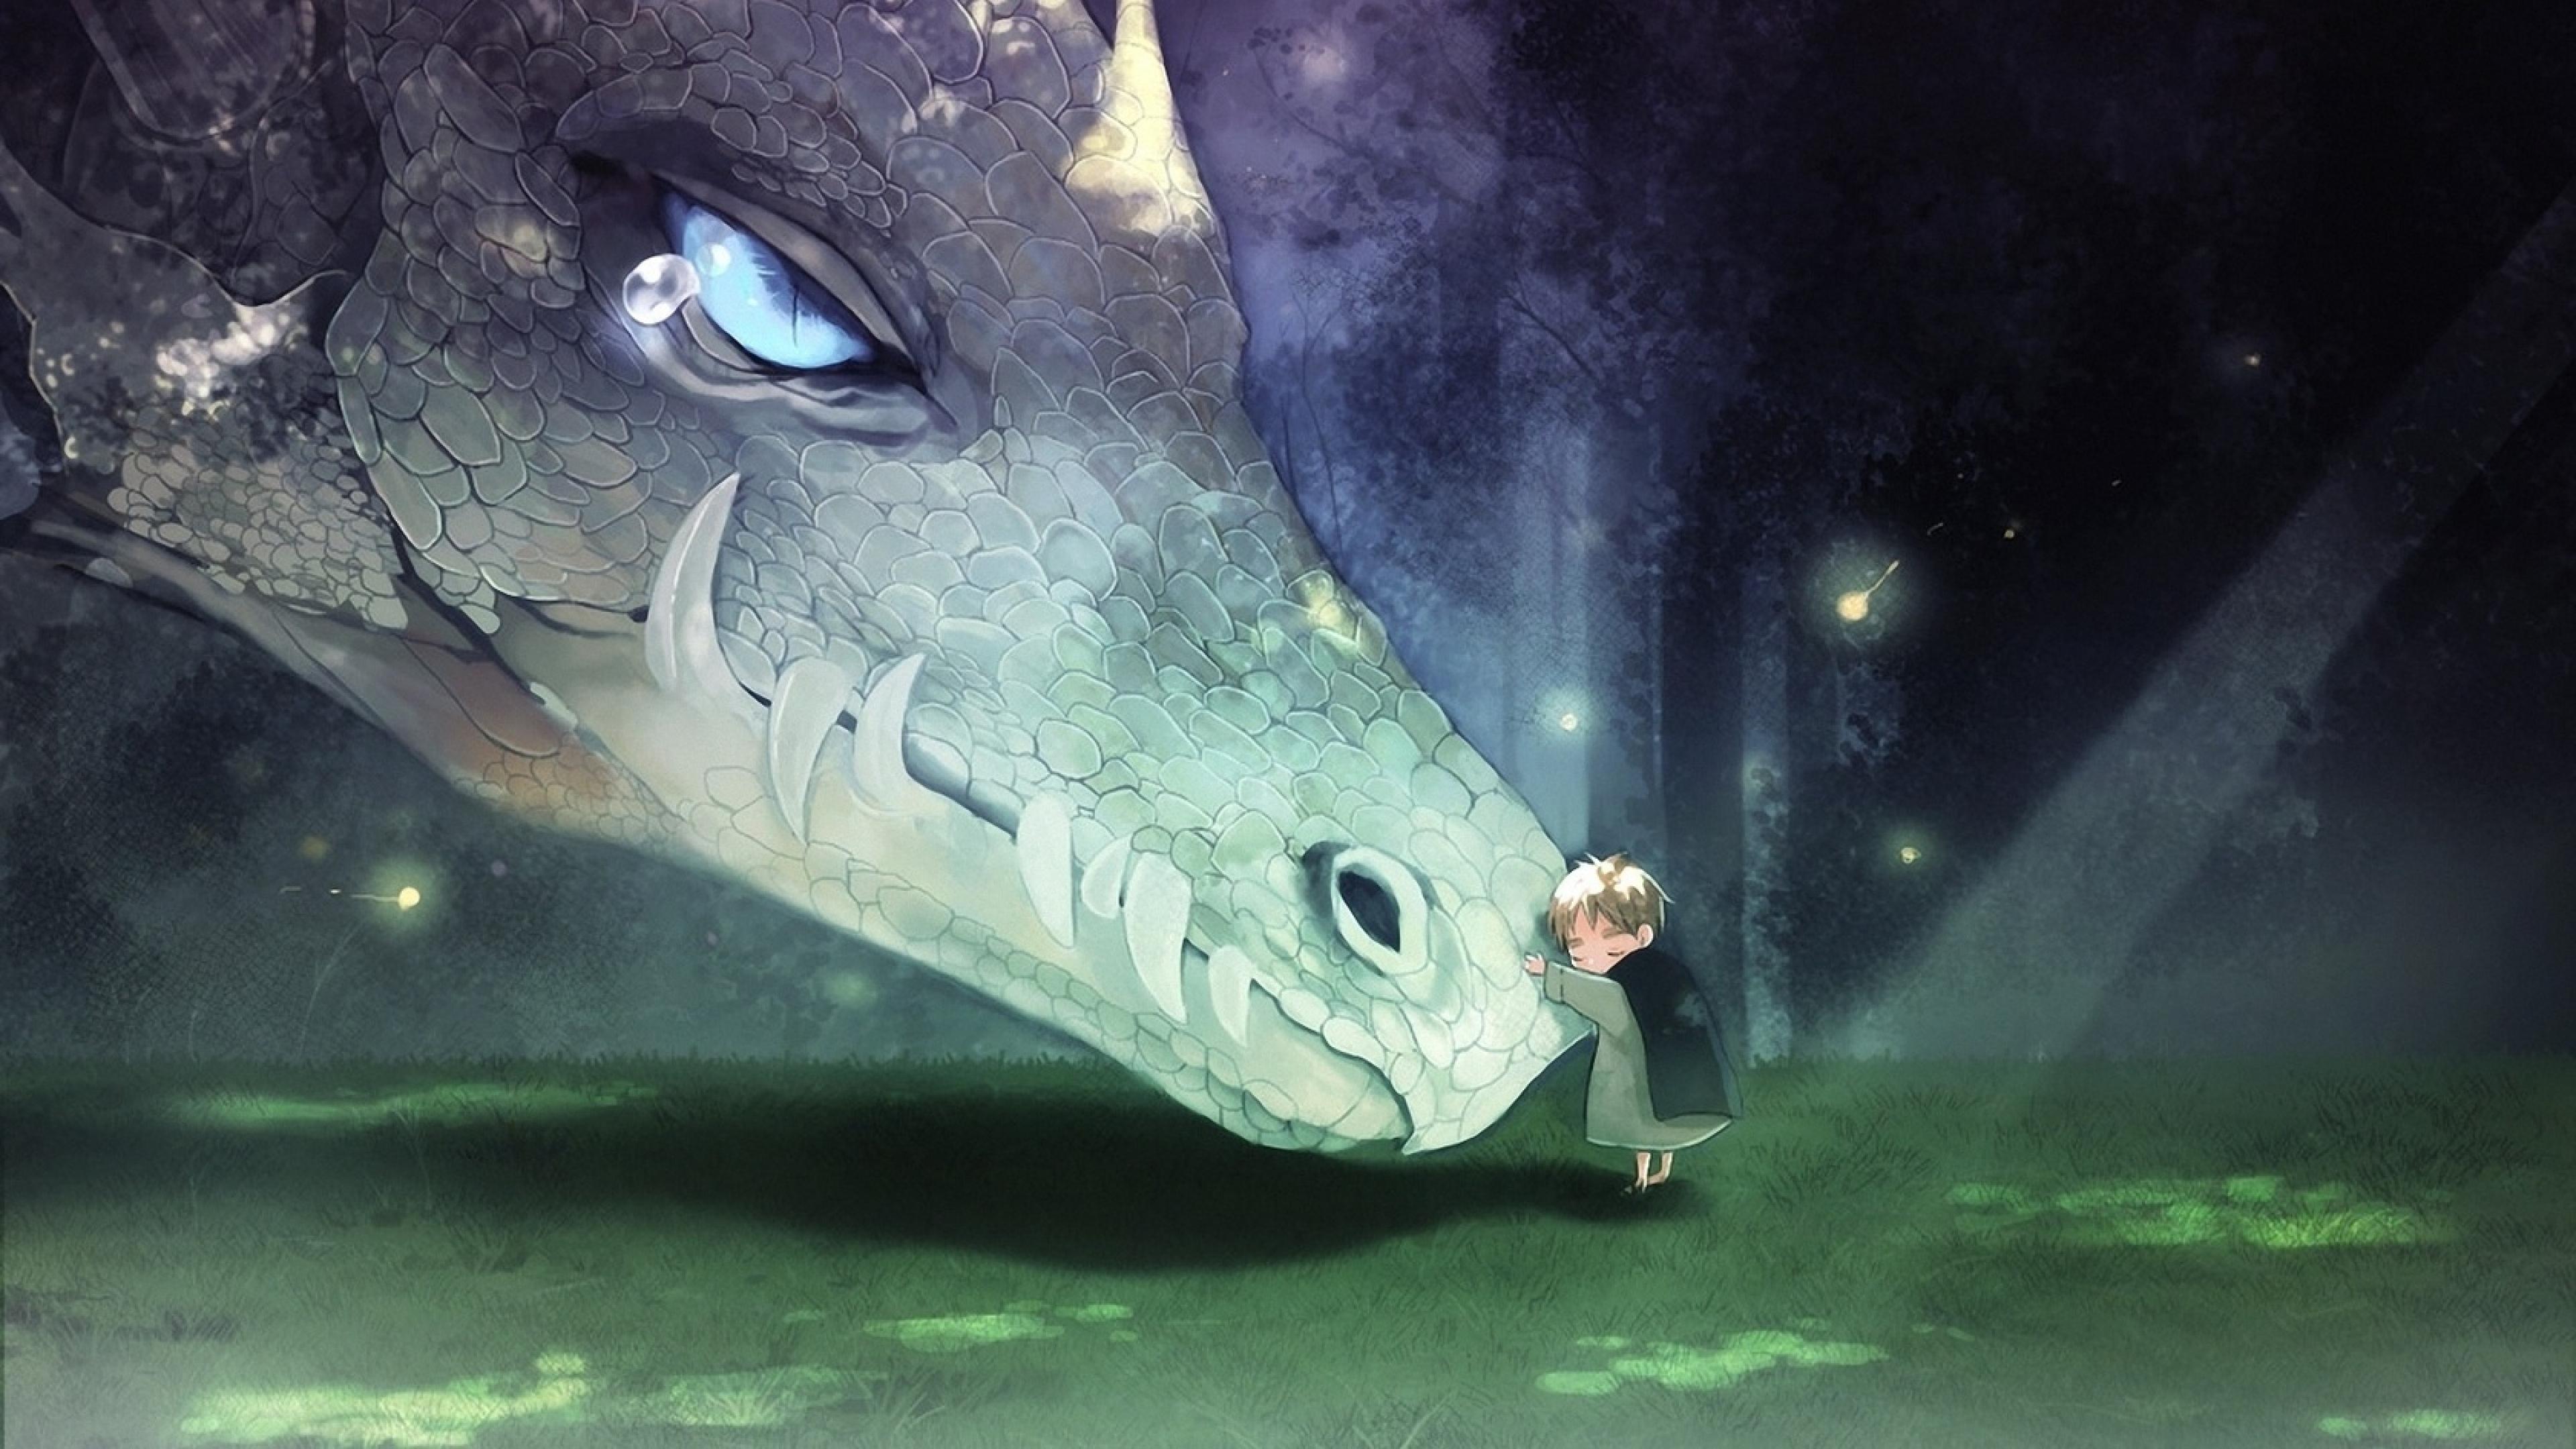 Download Wallpaper 3840x2160 Anime Fantasy Dragon Baby Friends 4K 3840x2160